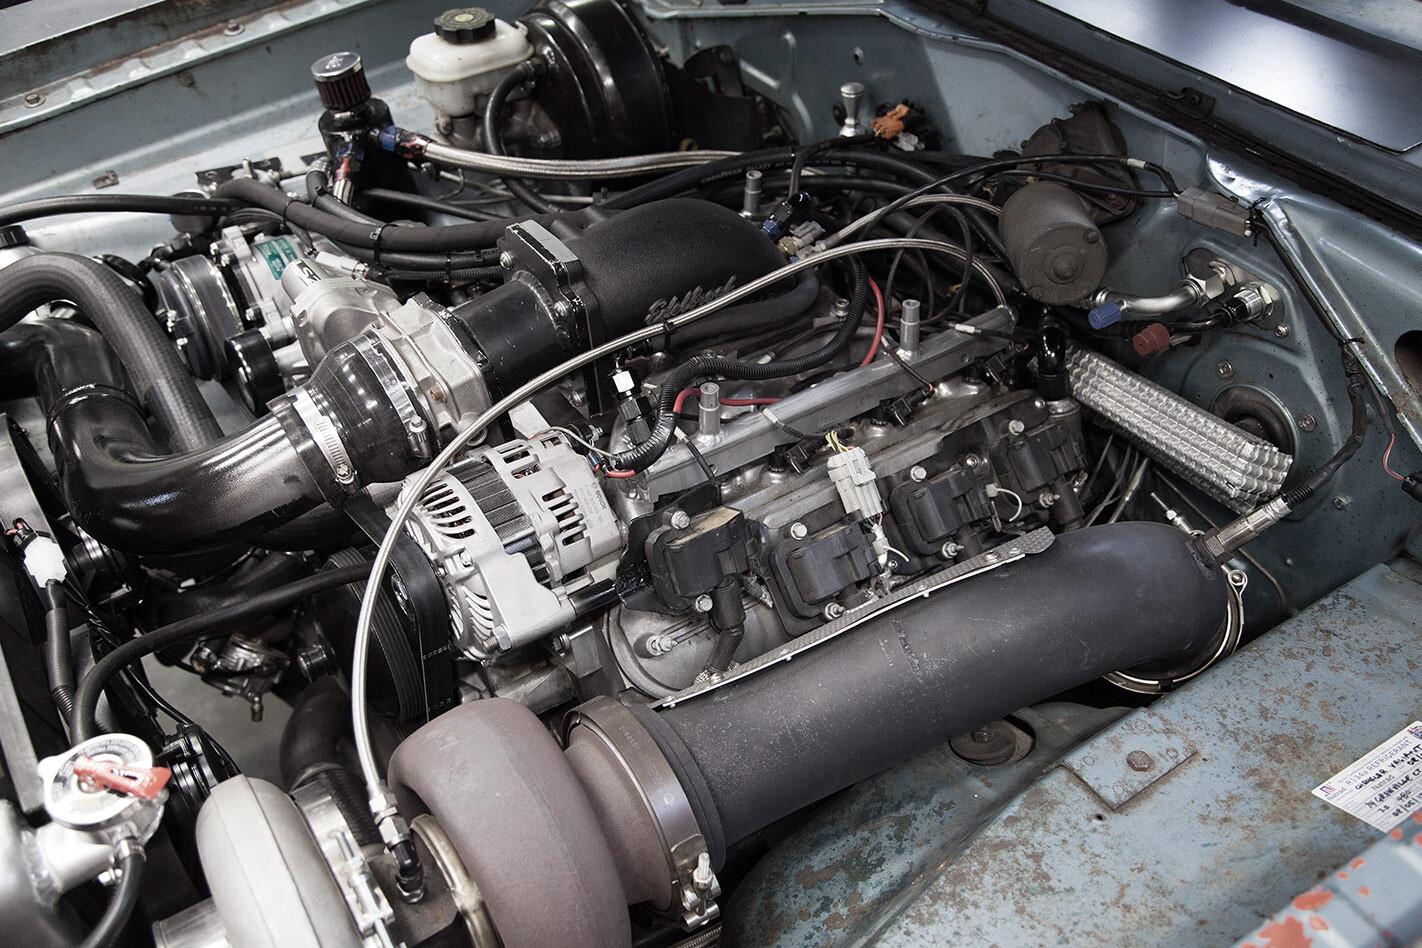 POR440 Valiant engine